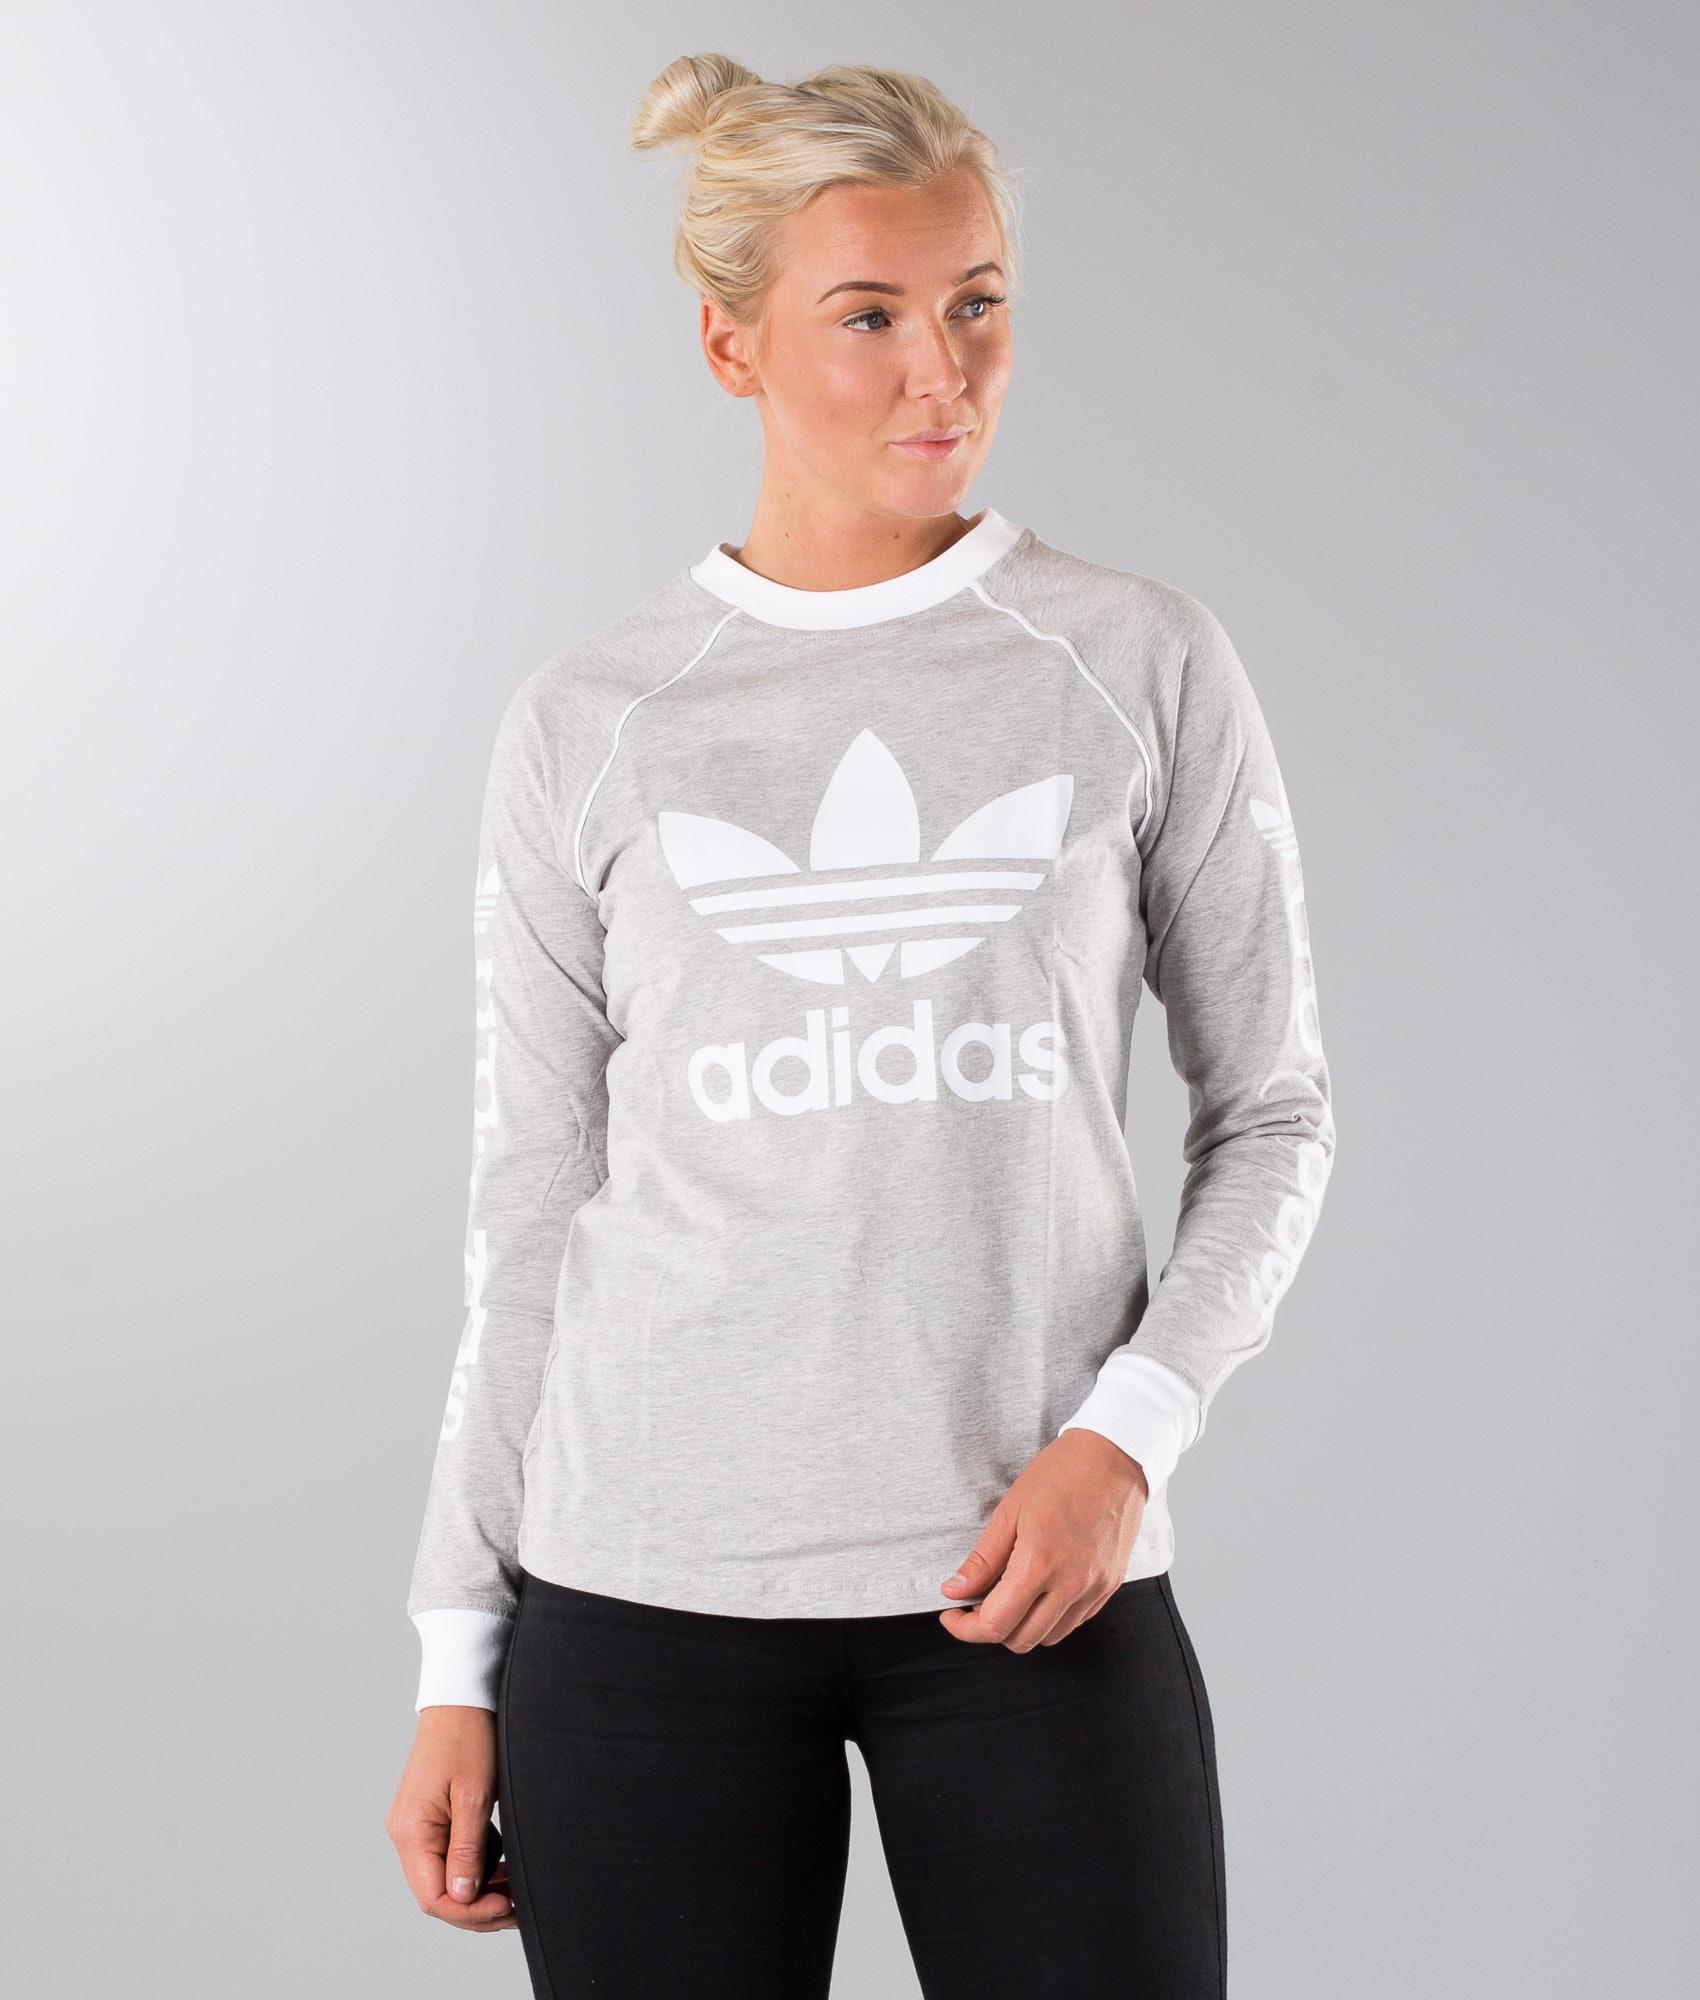 b88ad2e1c Adidas Originals OG Longsleeve Medium Grey Heather - Ridestore.com